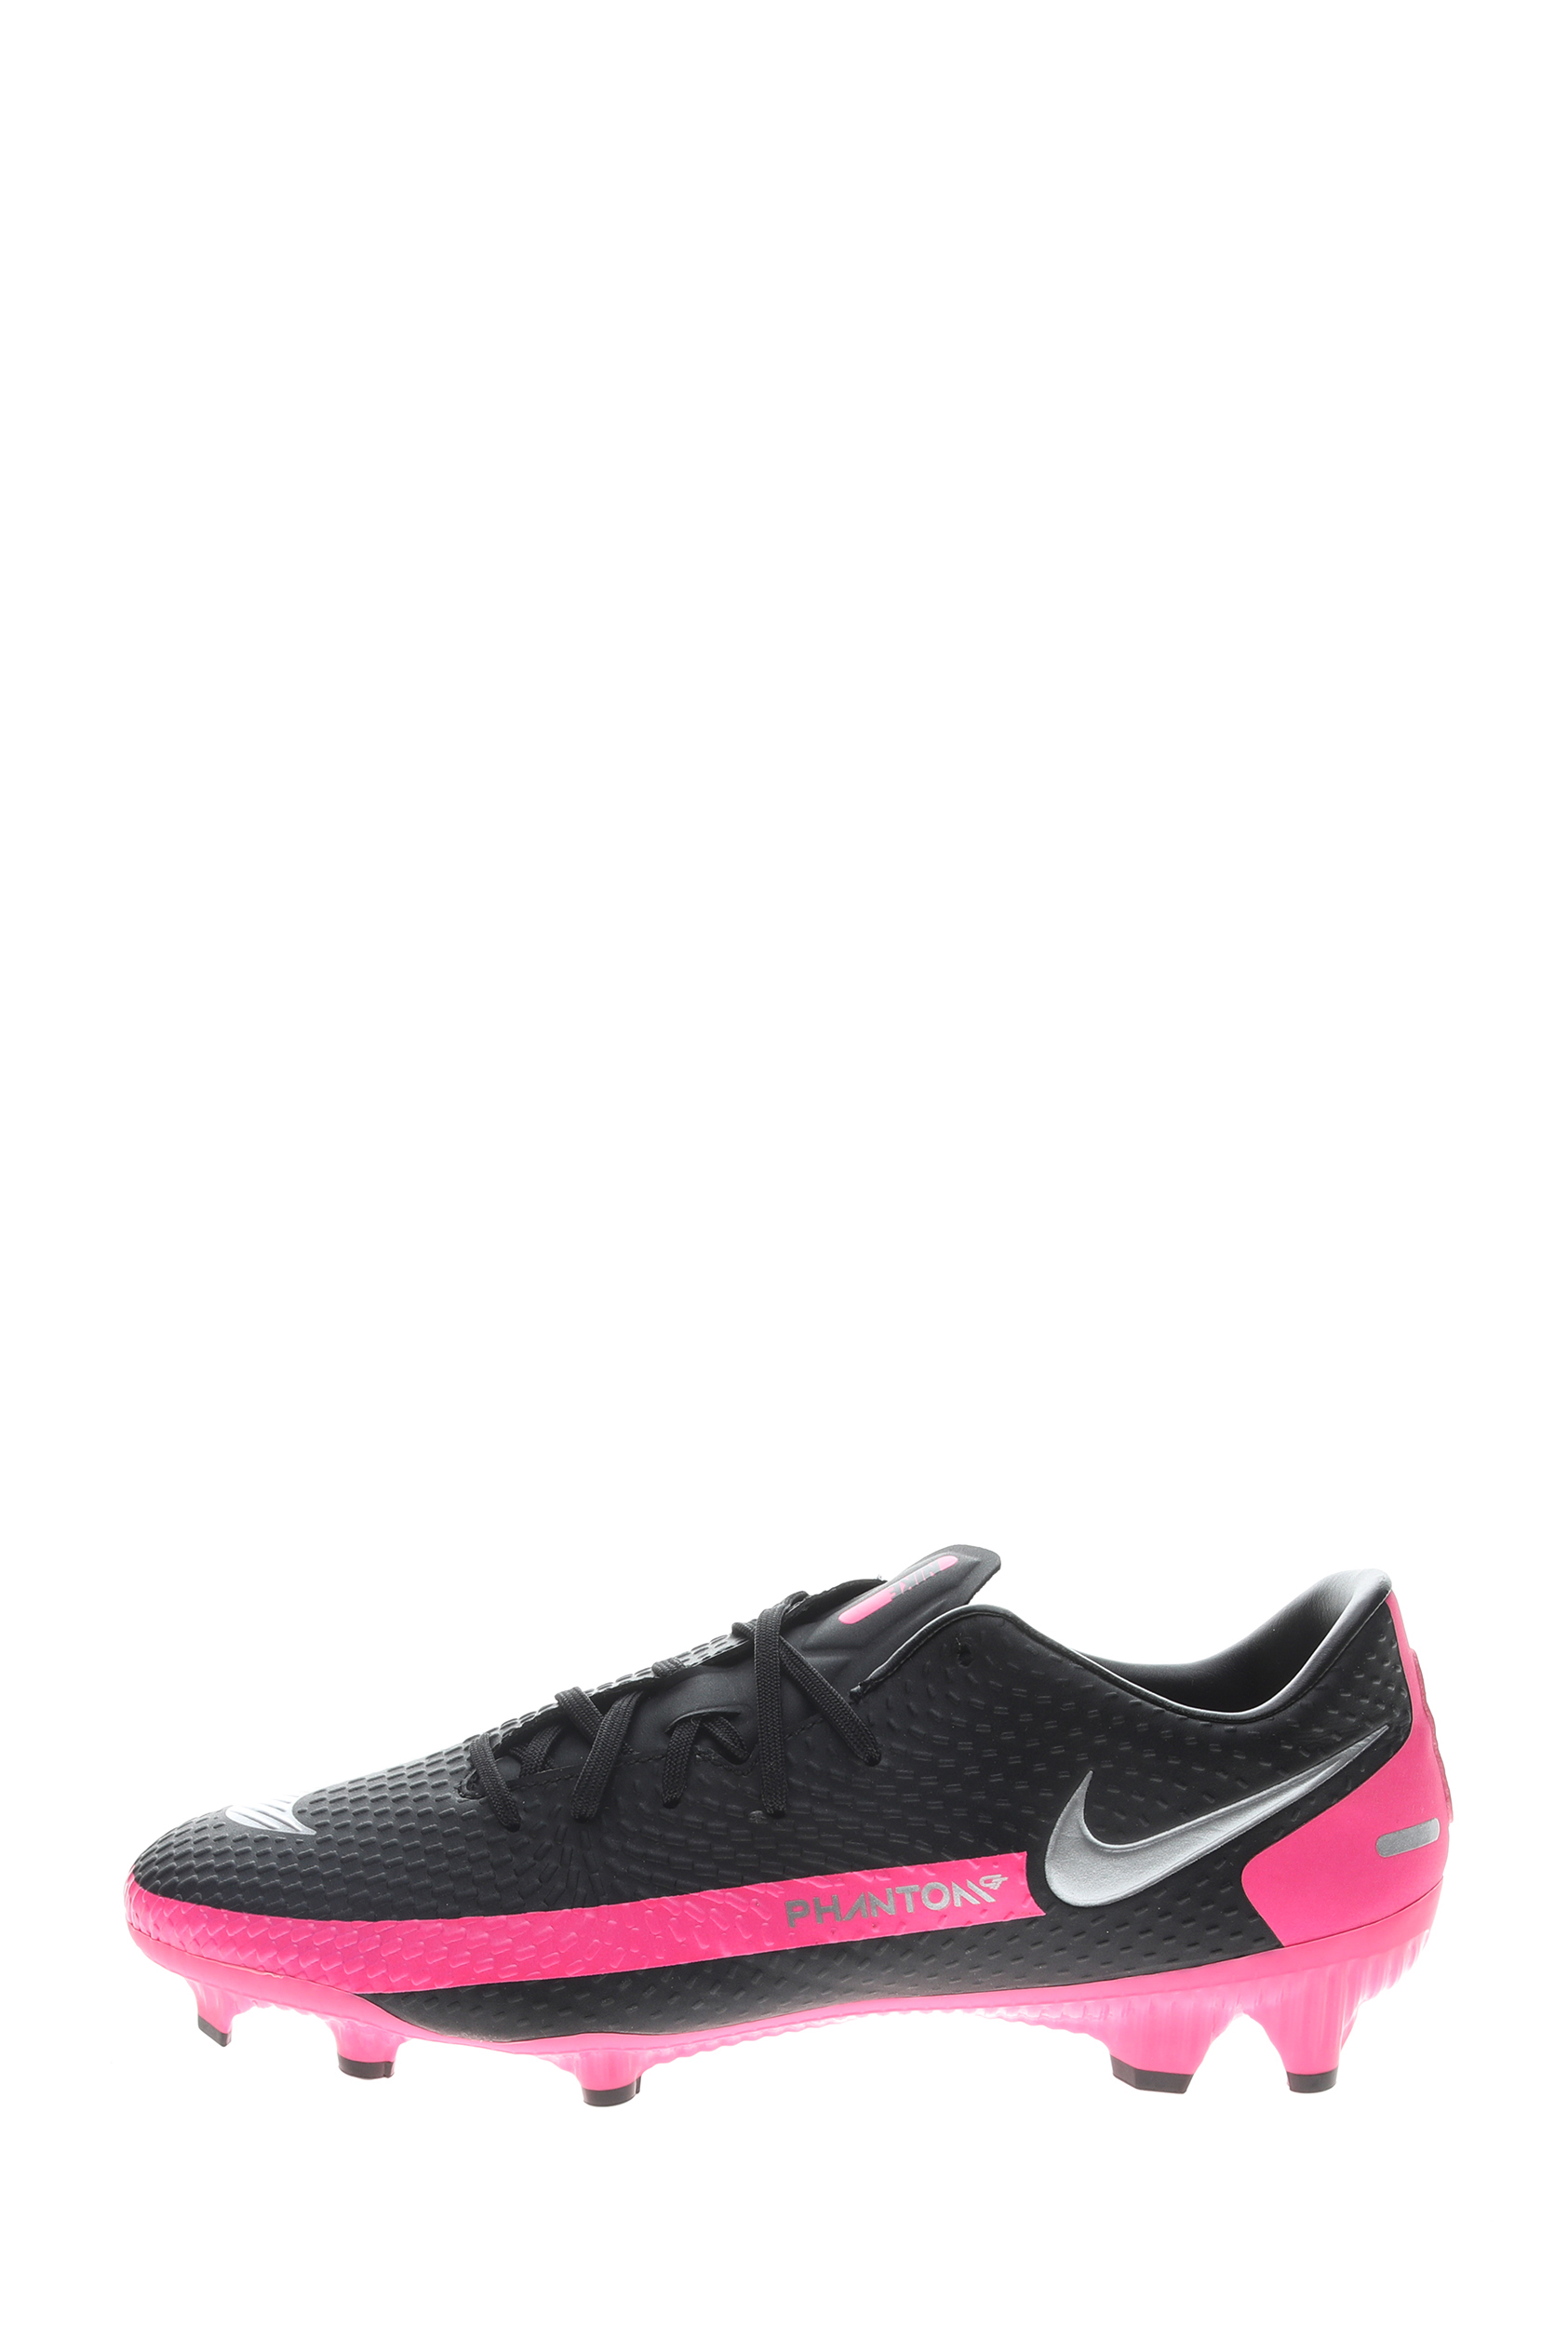 NIKE – Unisex παπουτσια football NIKE PHANTOM GT ACADEMY FG/MG μαύρα ροζ